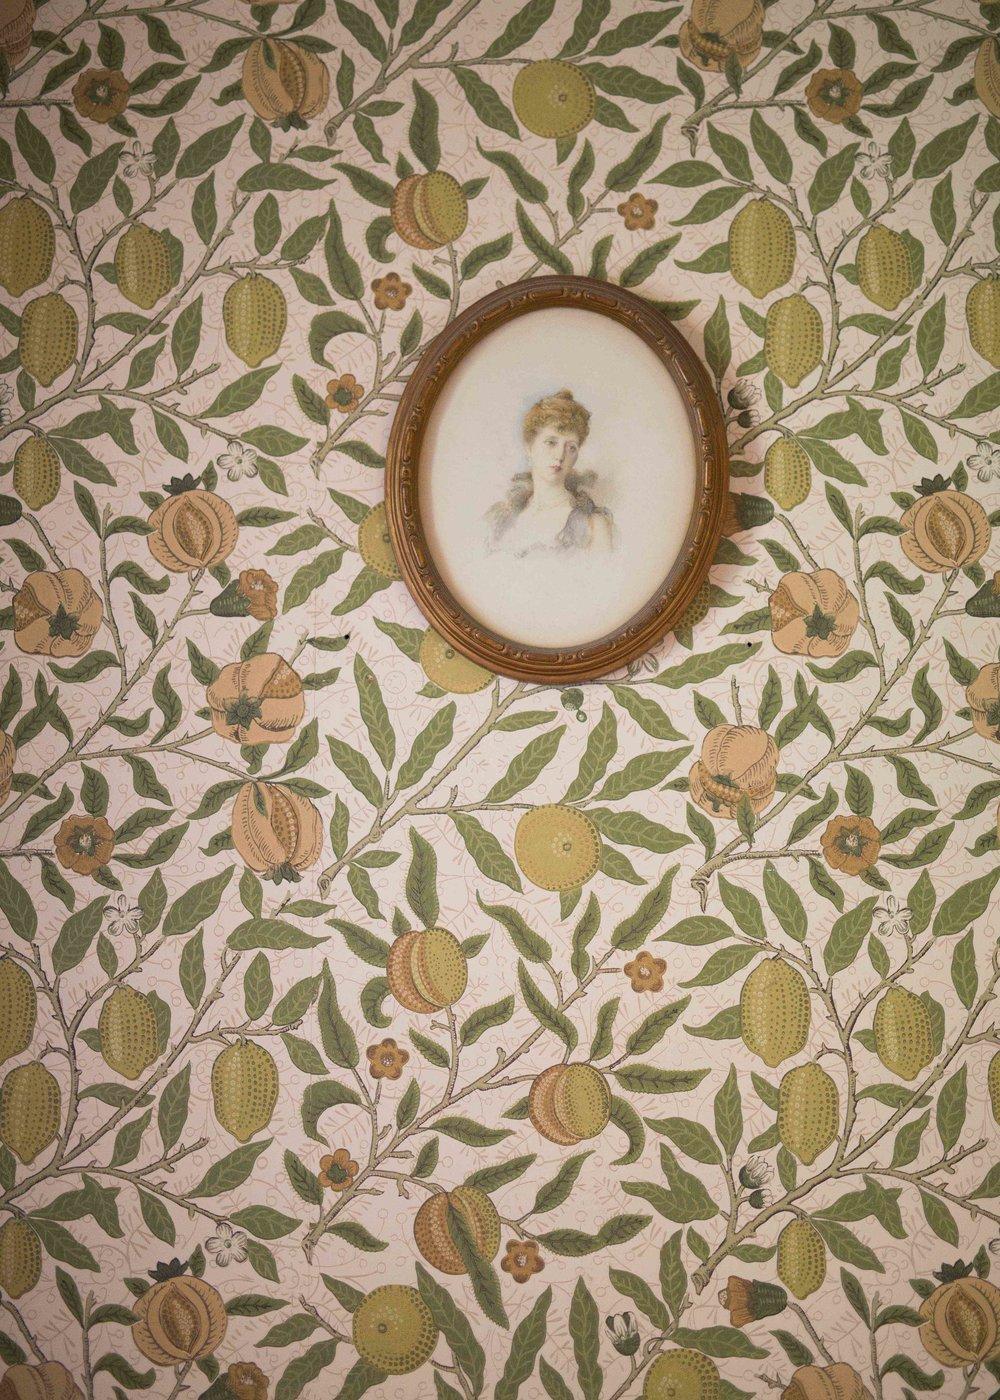 megan-ogden-ladies-of-pemberley-semi-zine-artist-feature-submission-7.jpg